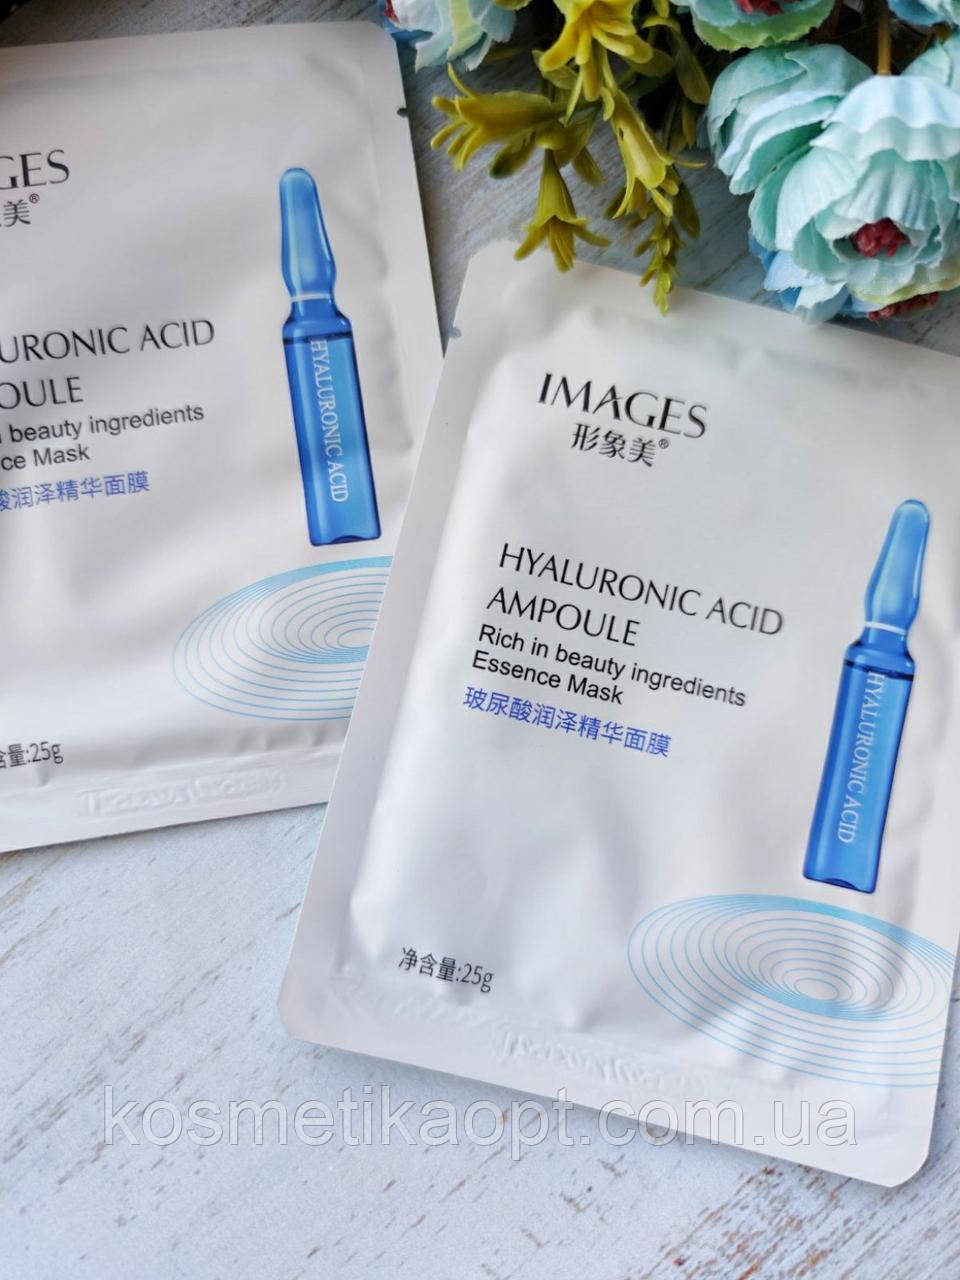 Тканевая маска с гиалуроновой кислотой Images Hyaluronic Acid Ampoule Facial Mask